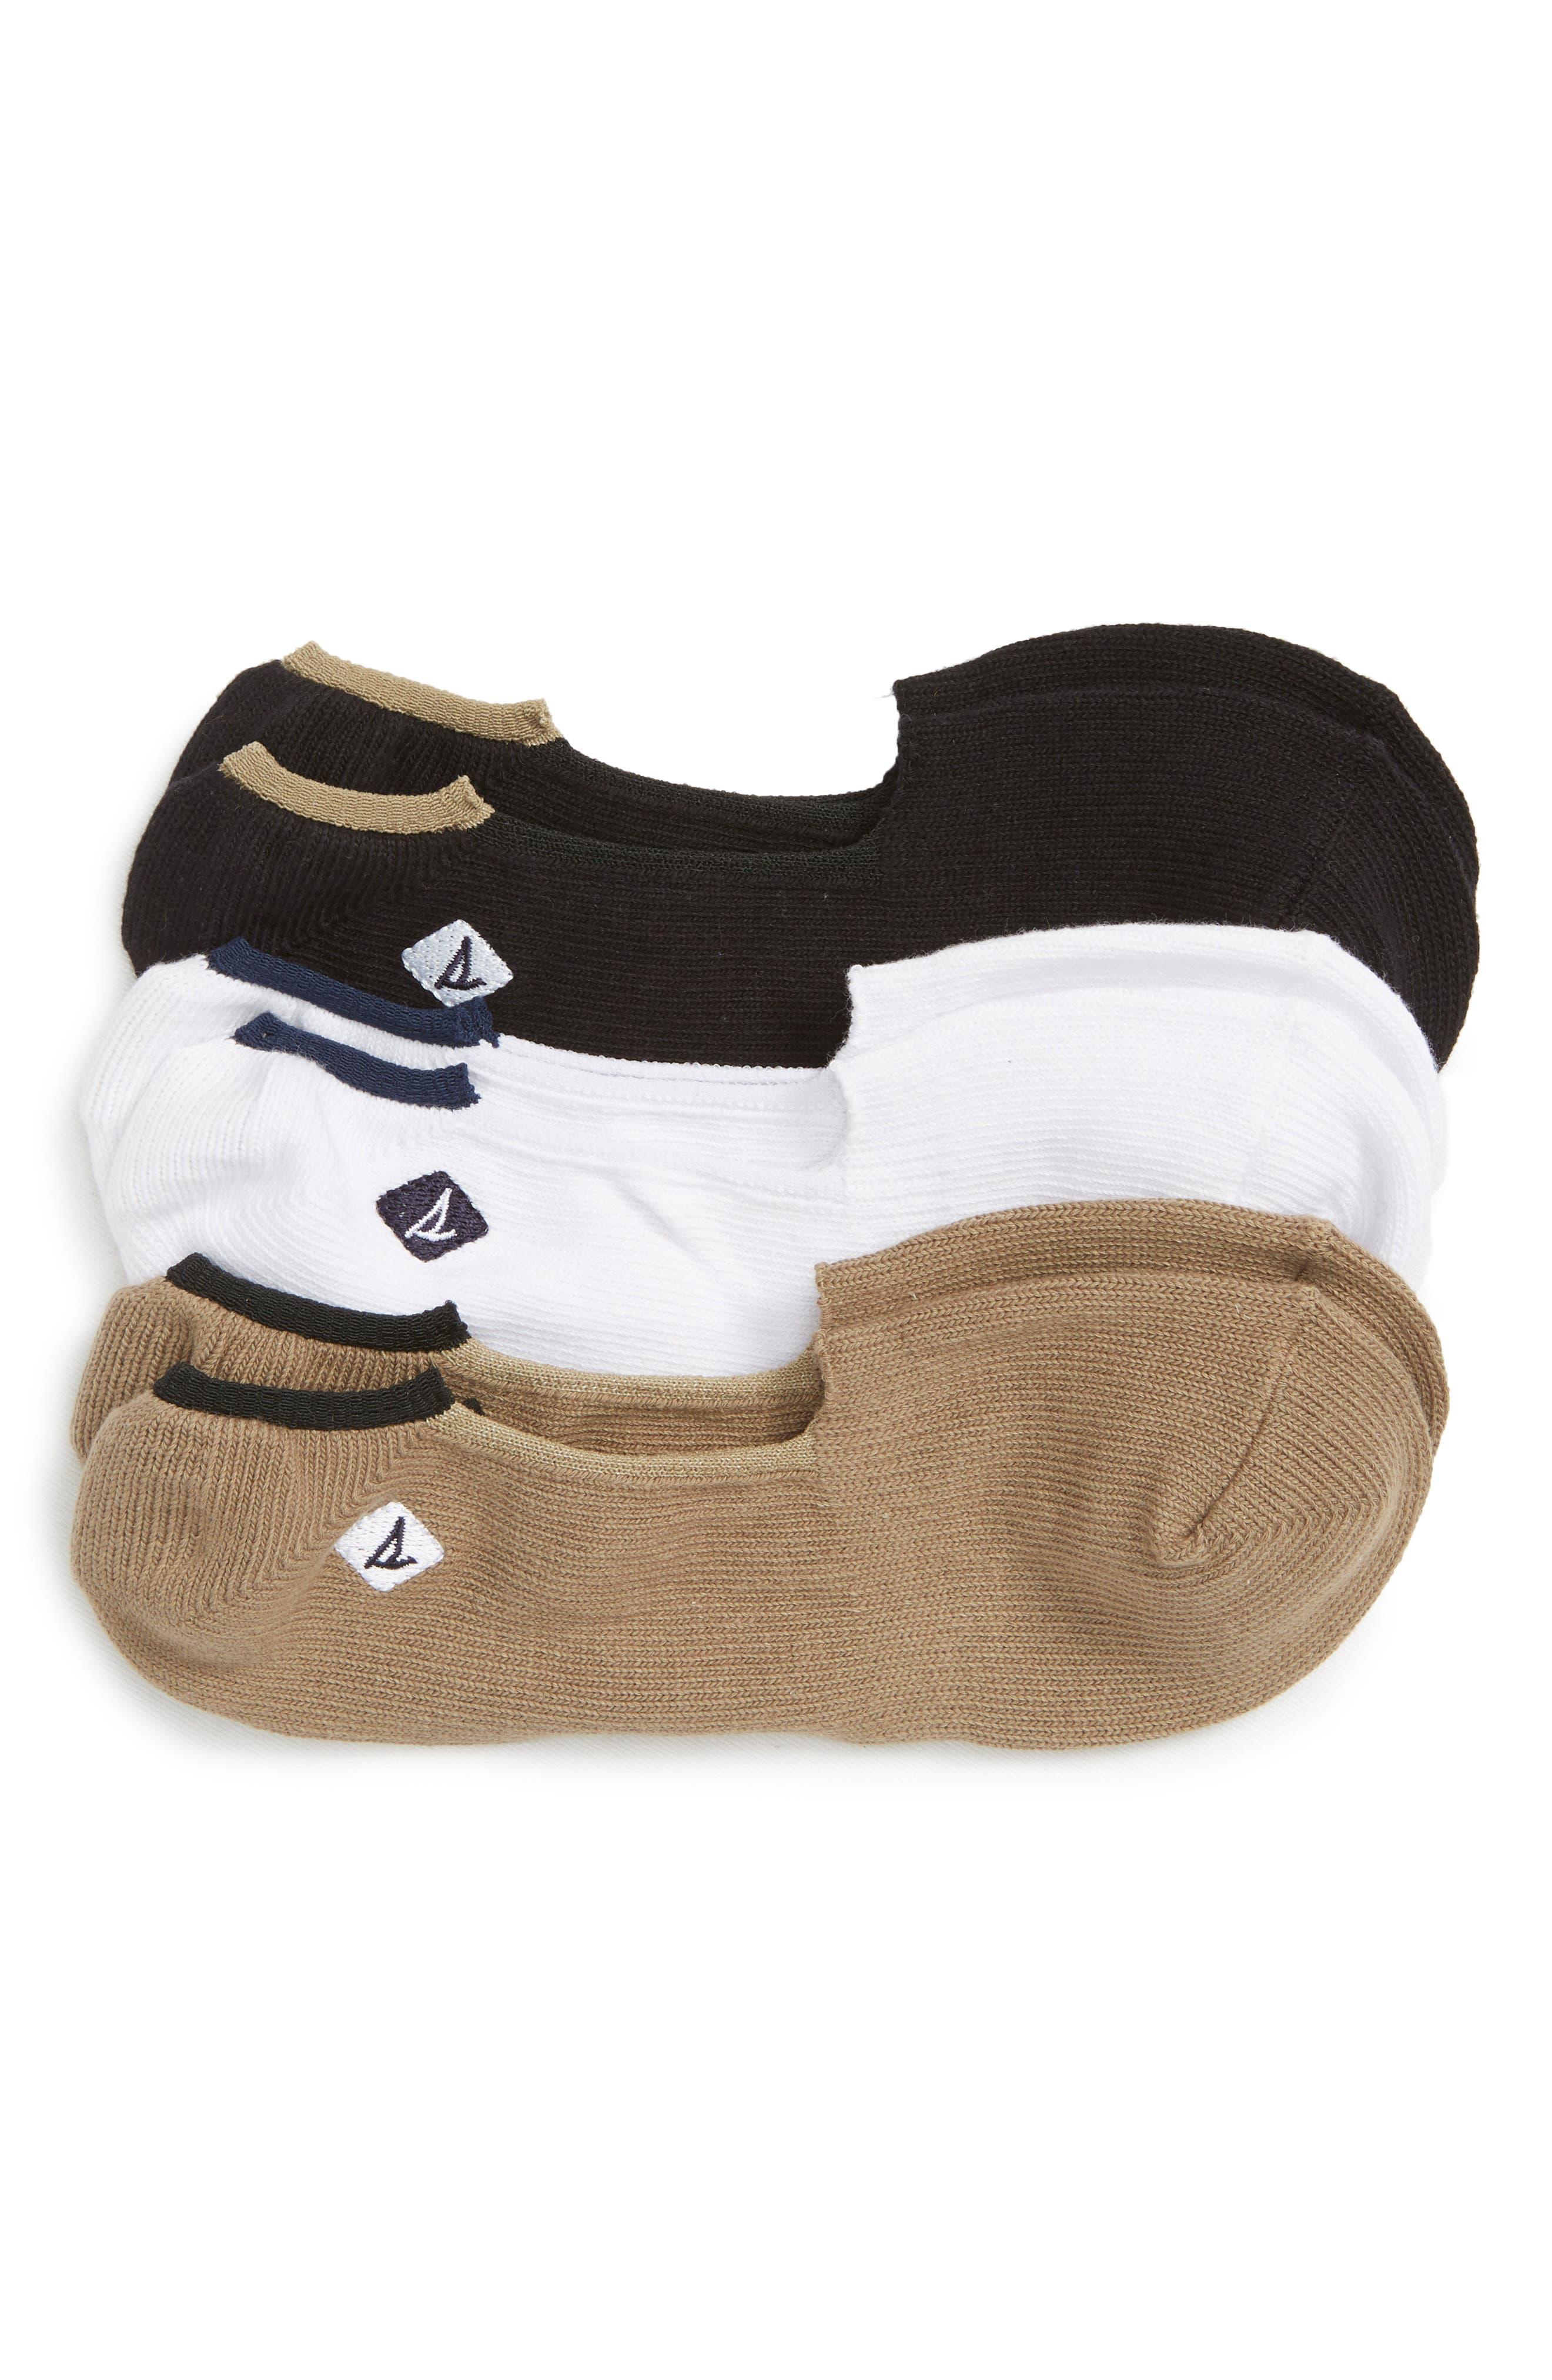 Skimmer 3-Pack Liner Socks,                             Main thumbnail 1, color,                             BLACK/ TAUPE